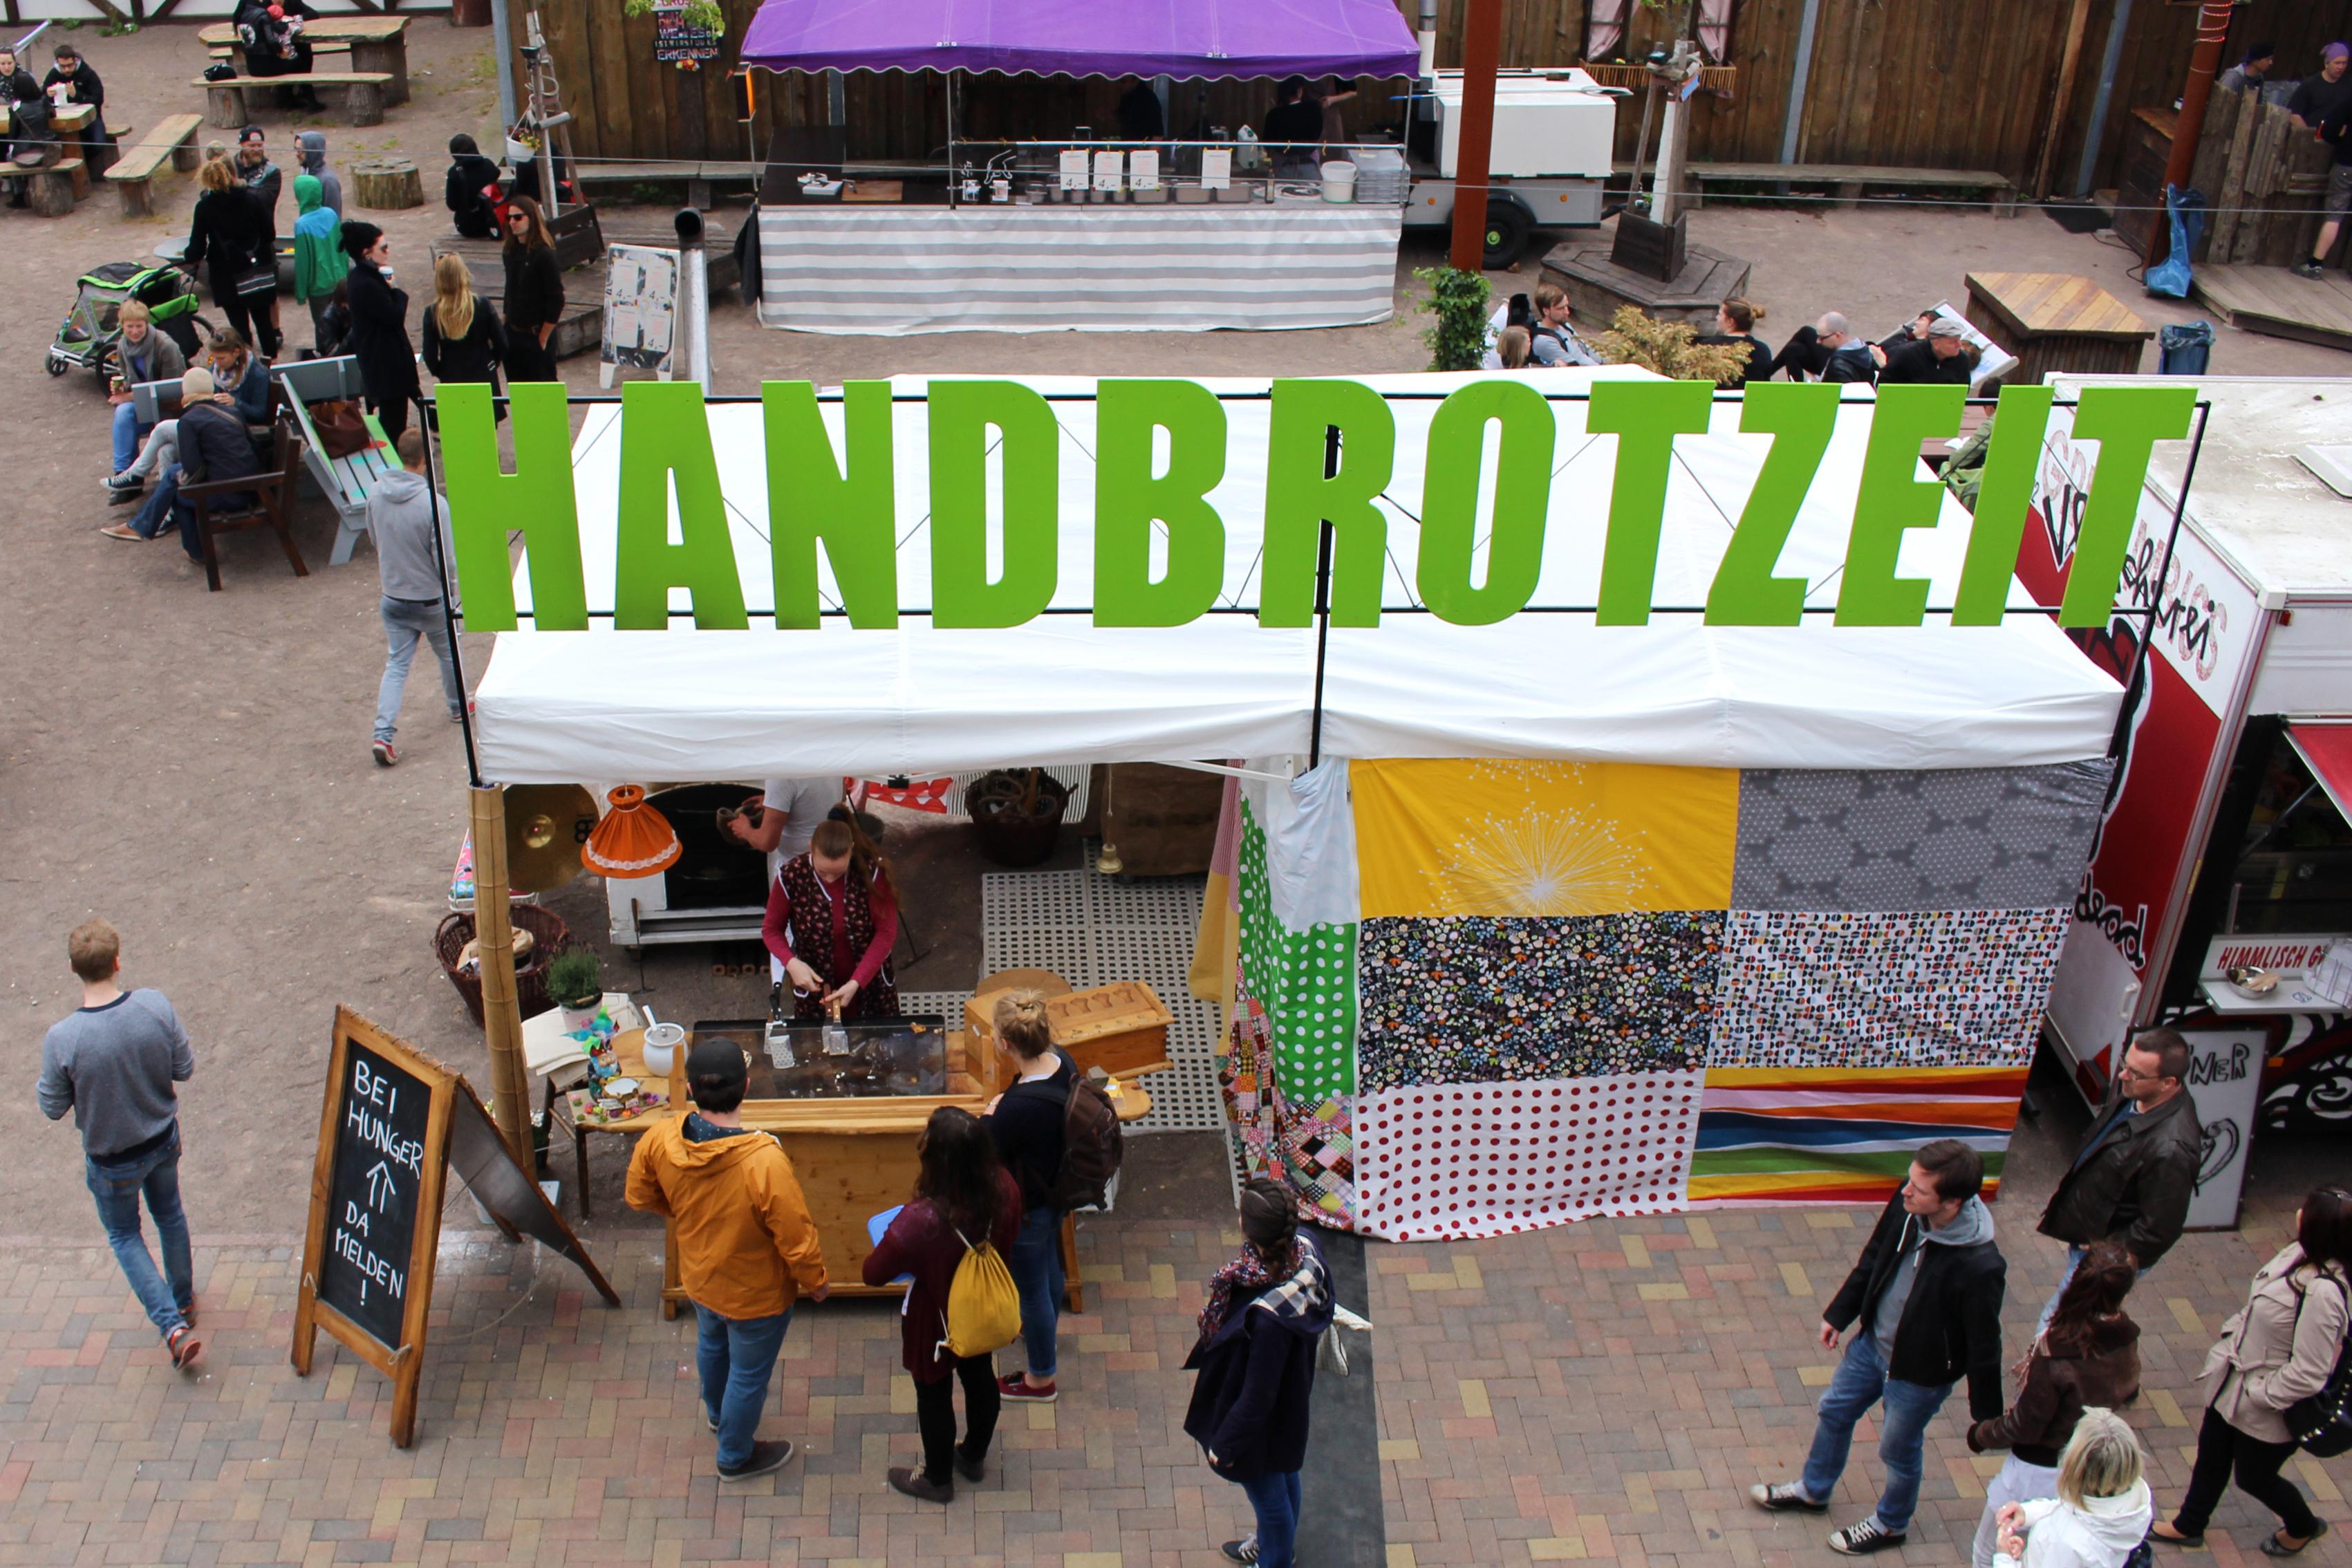 the-market-leipzig-täubchenthal-handbrotzeit